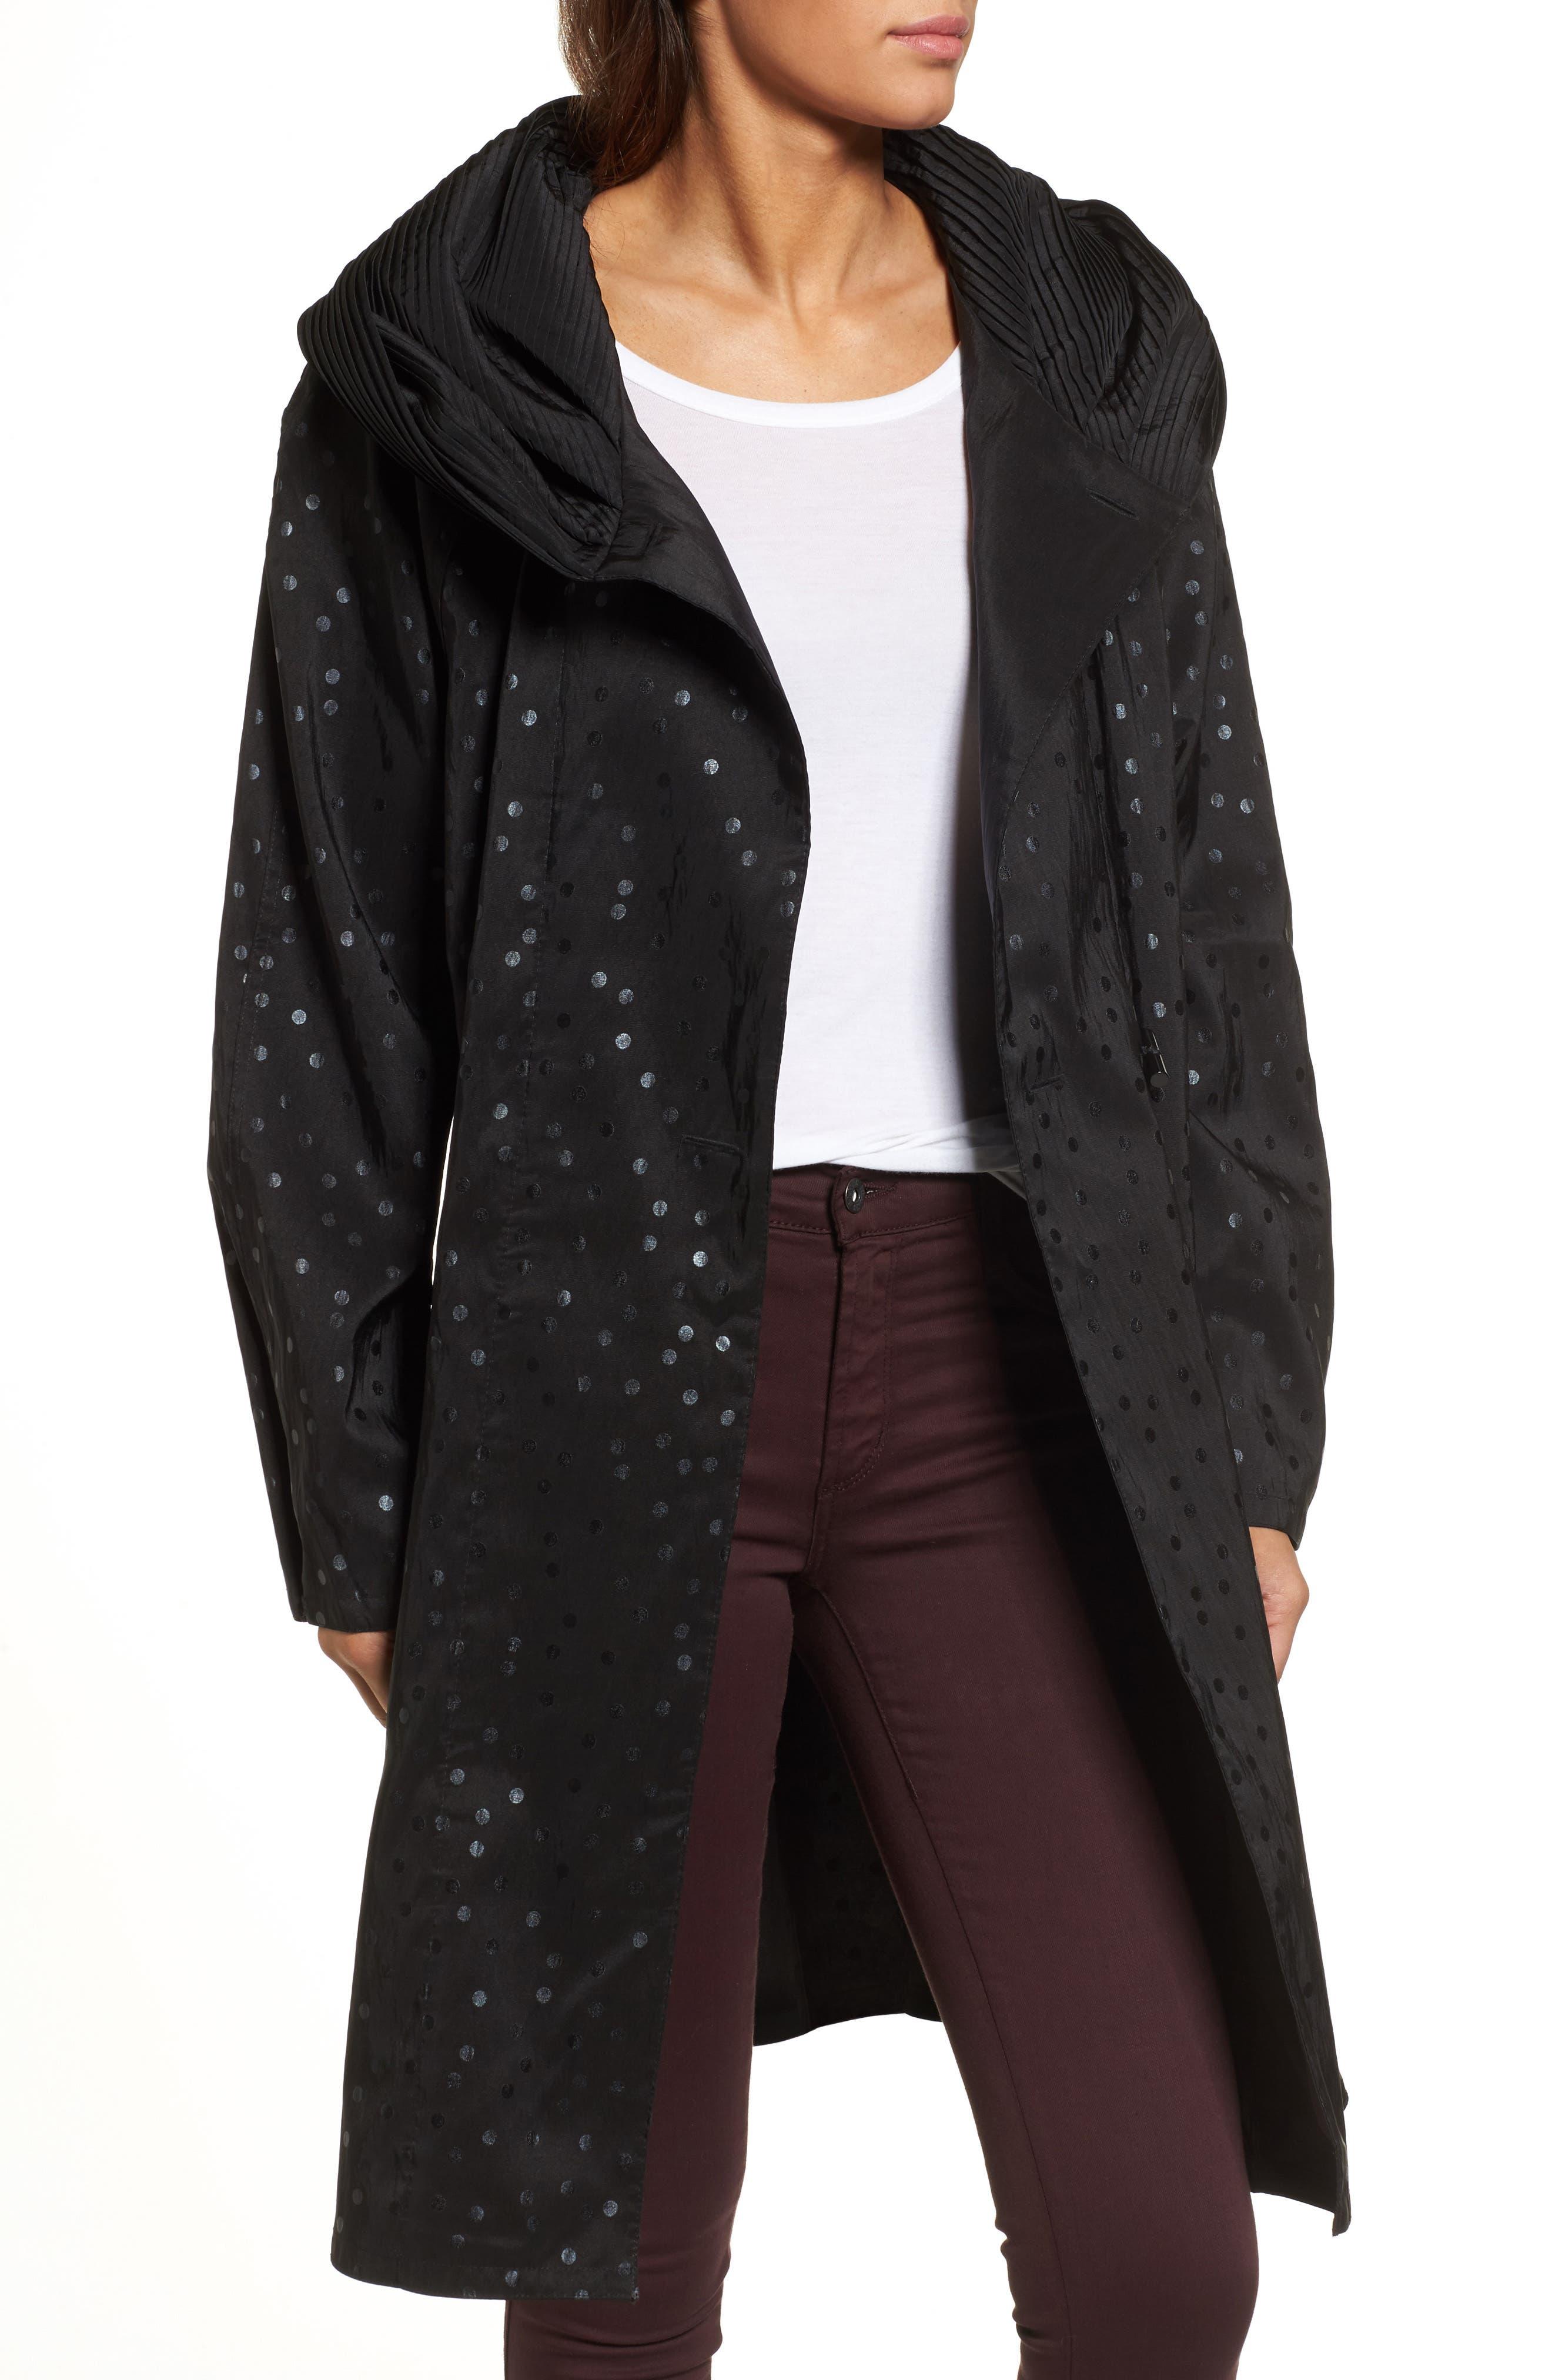 'Donatella' Reversible Dot Pleat Hood Packable Travel Coat,                             Alternate thumbnail 2, color,                             017